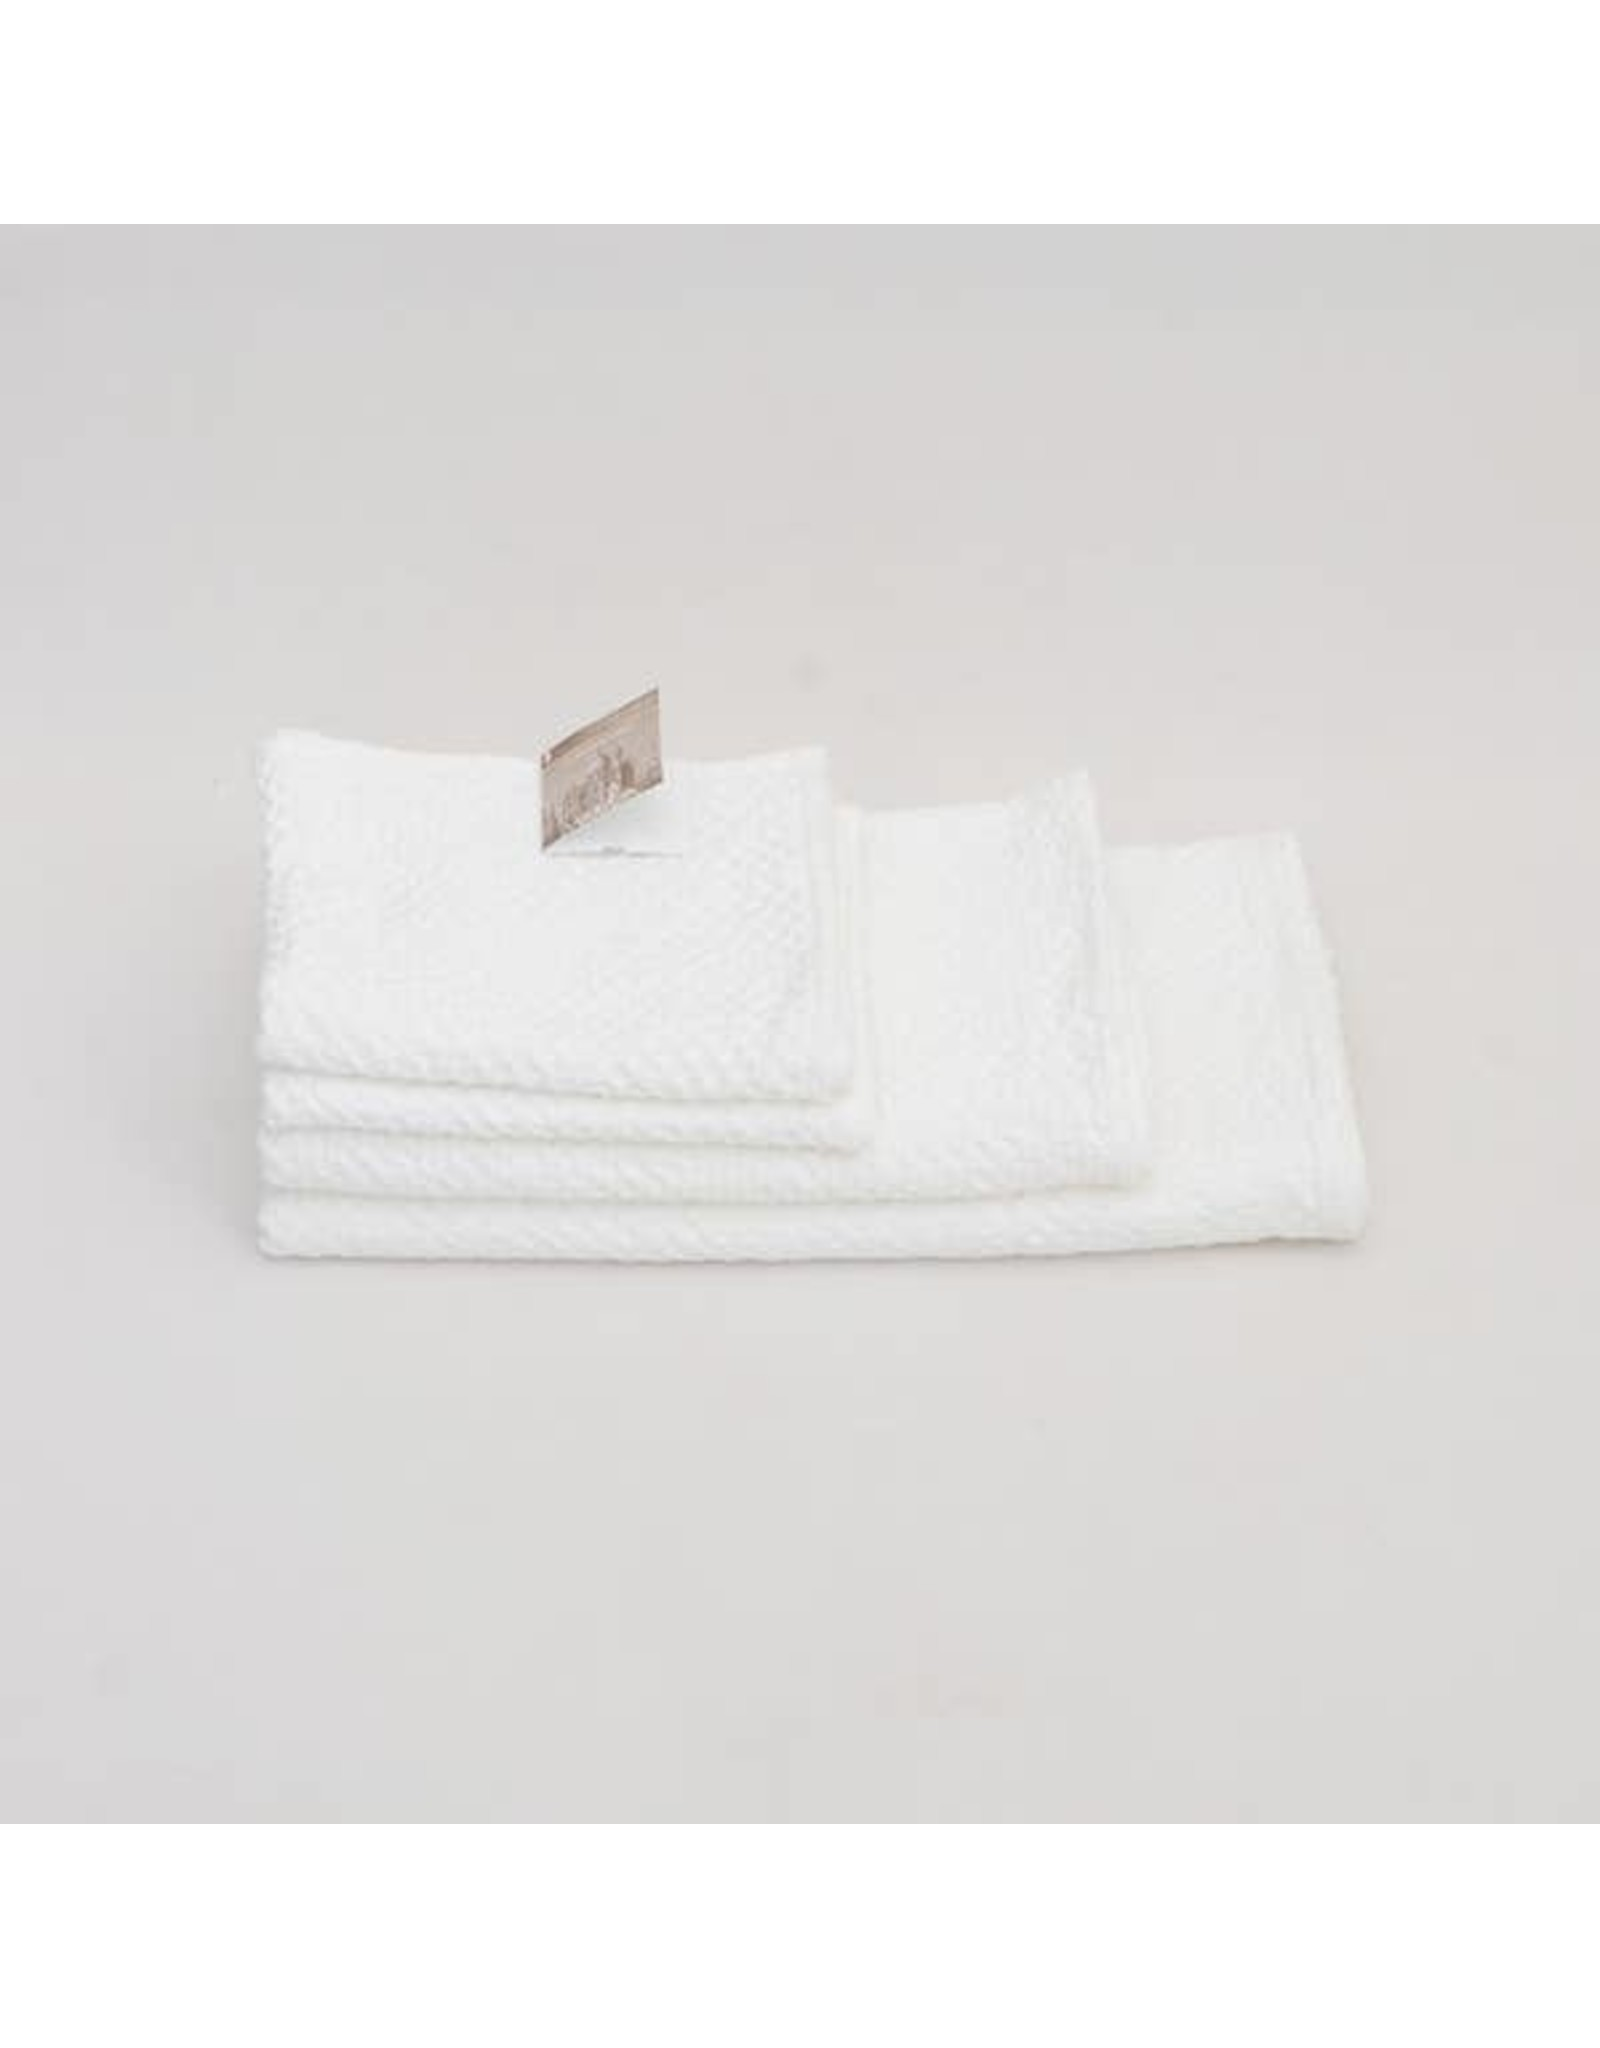 Mela Artisans Organic Cotton  Bath Towel Set